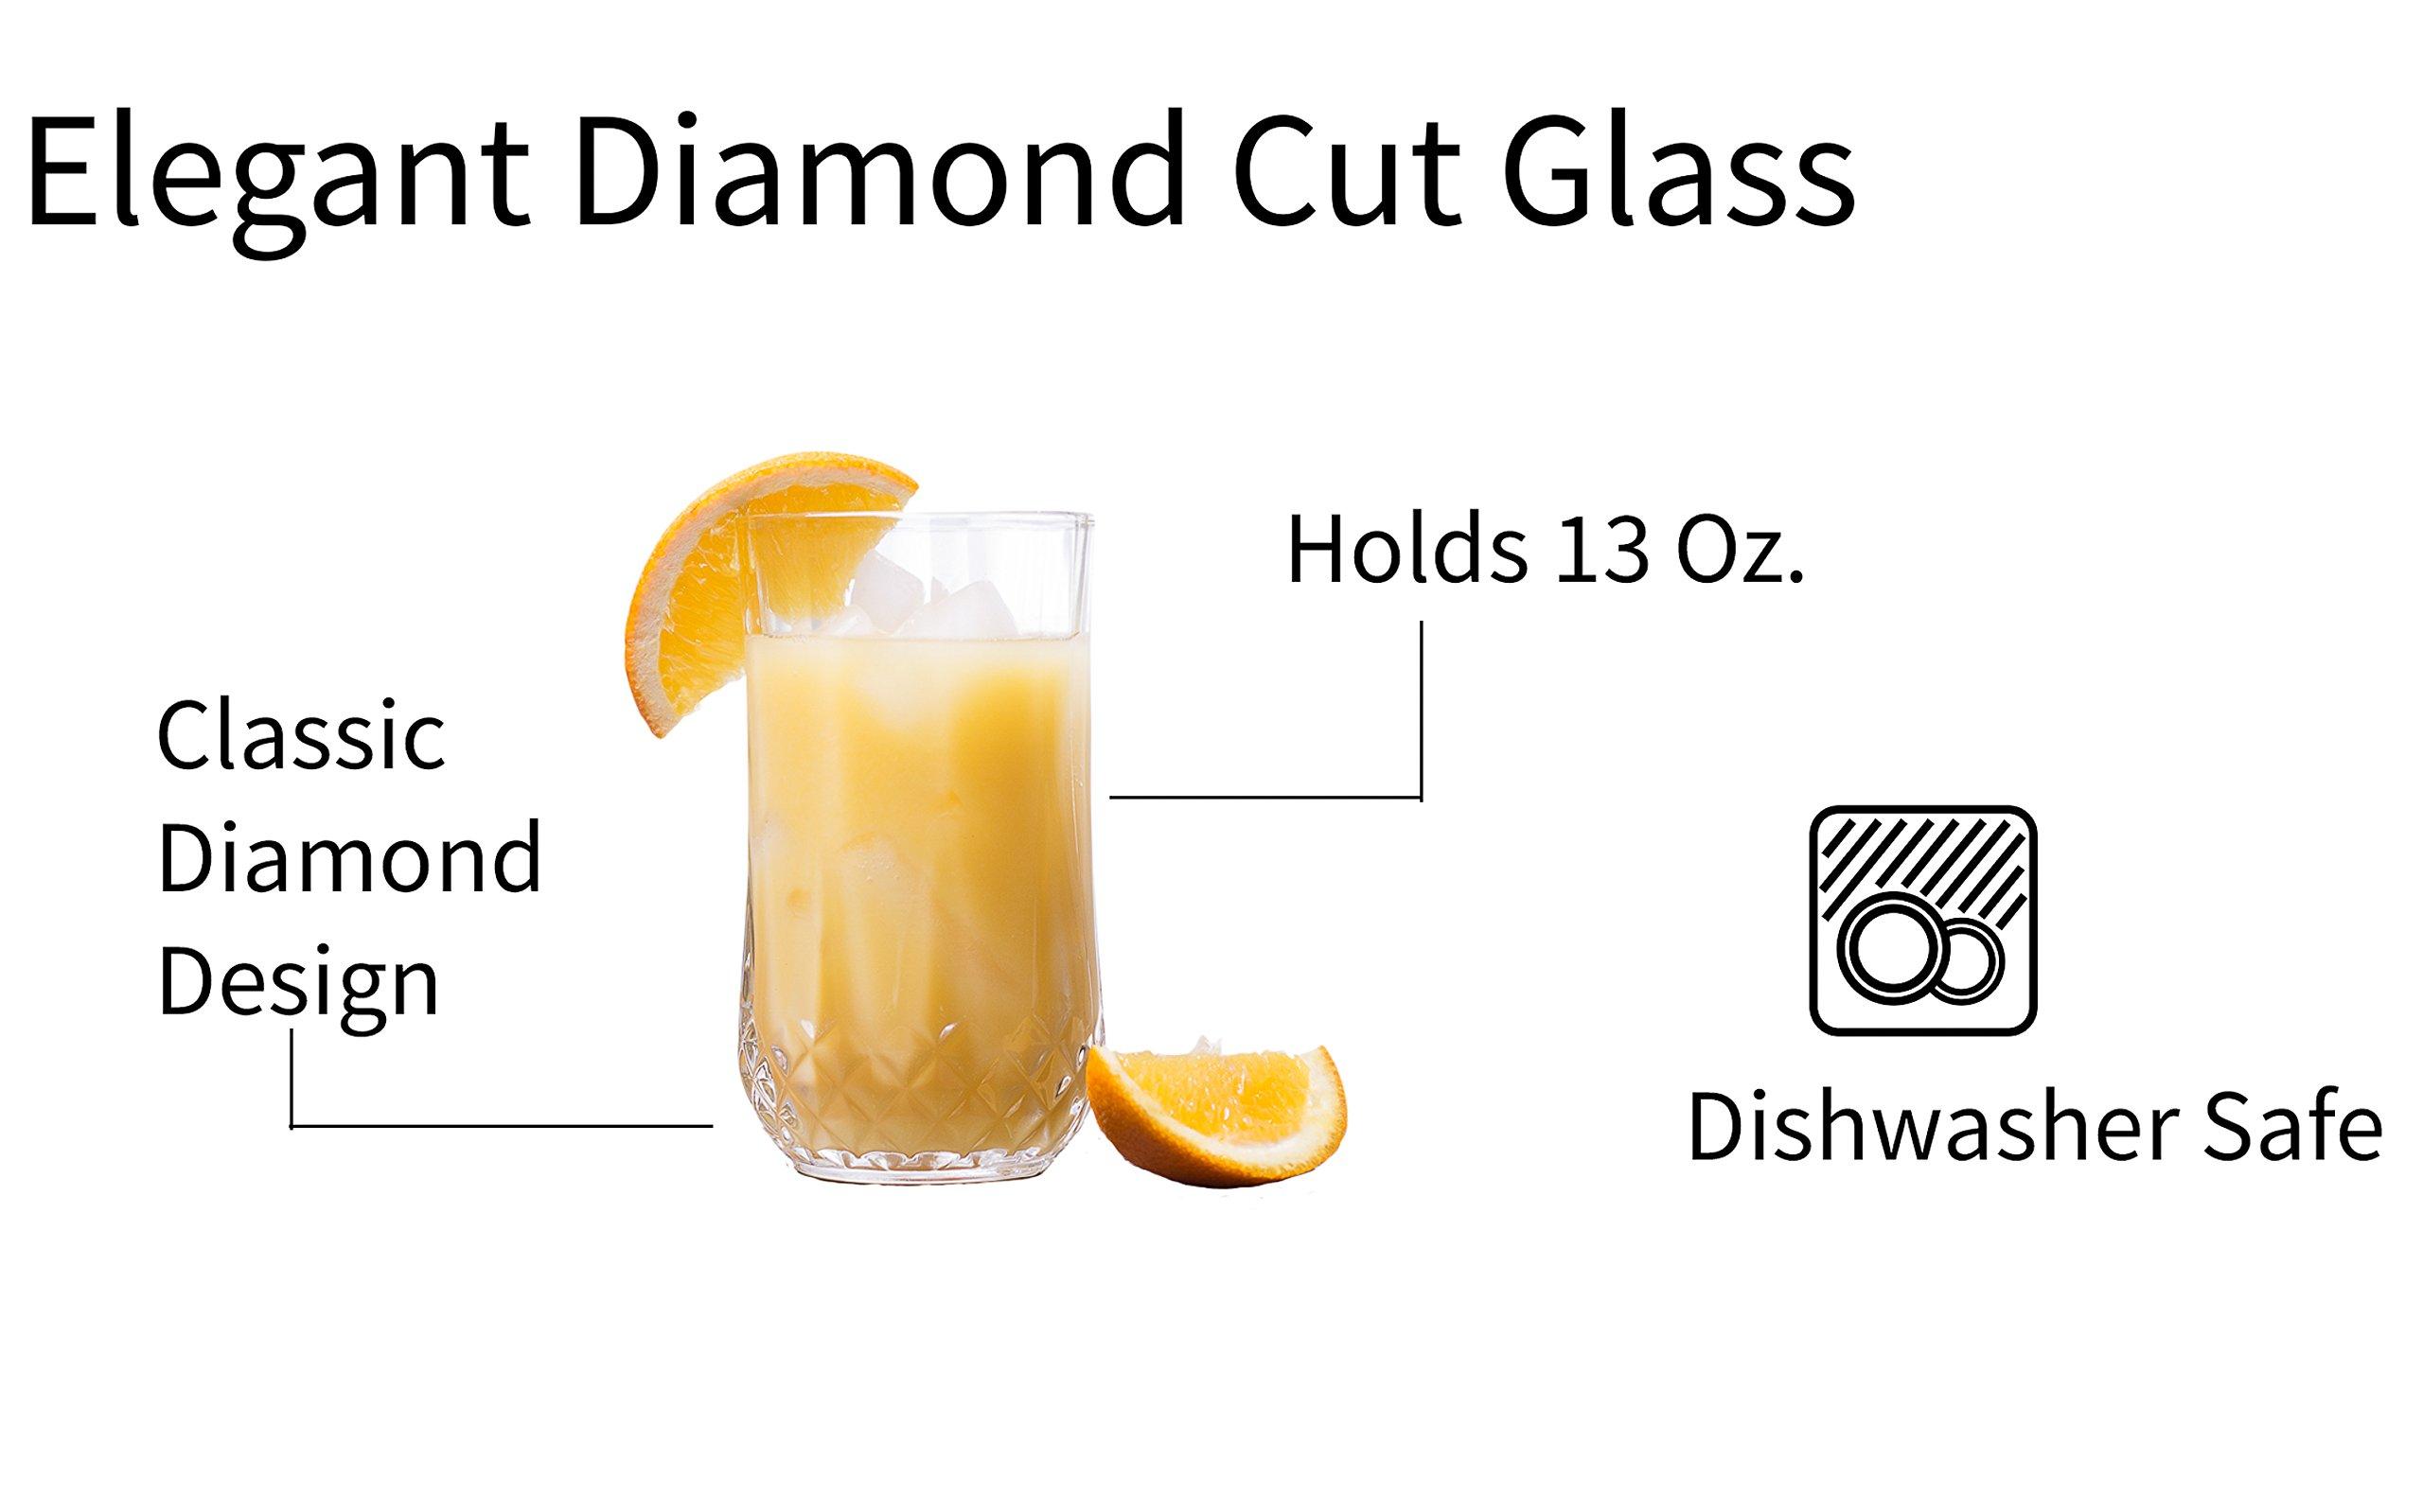 Palais Glassware 'Marseille' Mixed Drinkware, Elegant Diamond Cut Clear Glass set (Set of 12, 6 - 9 Oz. & 6 - 13 Oz.) by Palais Glassware (Image #6)